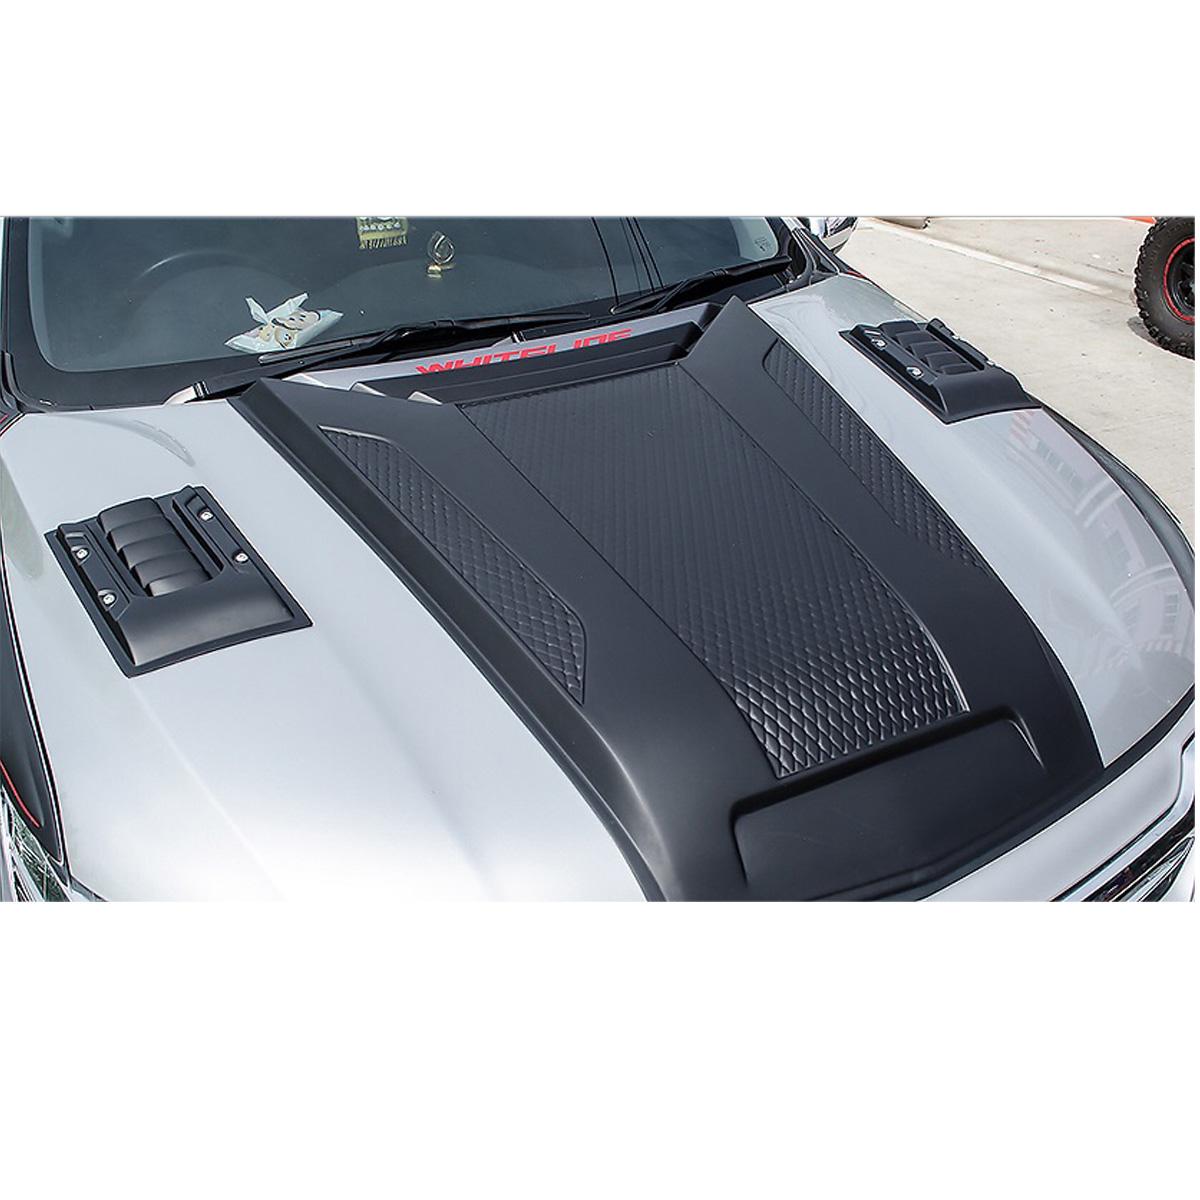 25 pcs #219 Chrysler Self Tap Windshield /& Rear Window Trim Molding Clip Screws